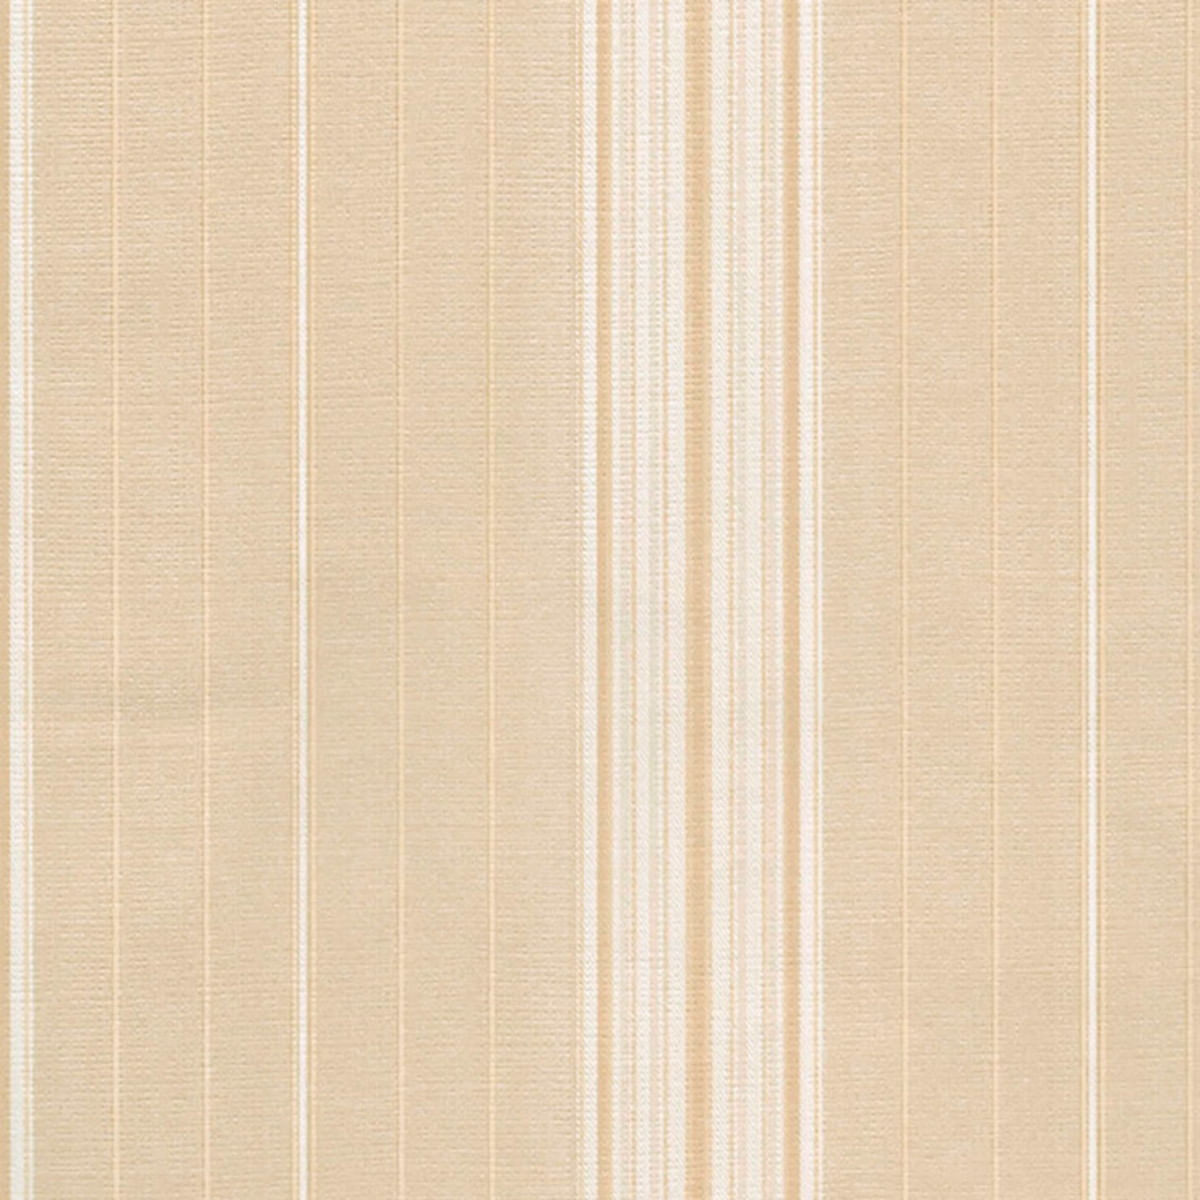 Papel de Parede Bobinex Atemporal 2862 - Rolo 10m x 52cm